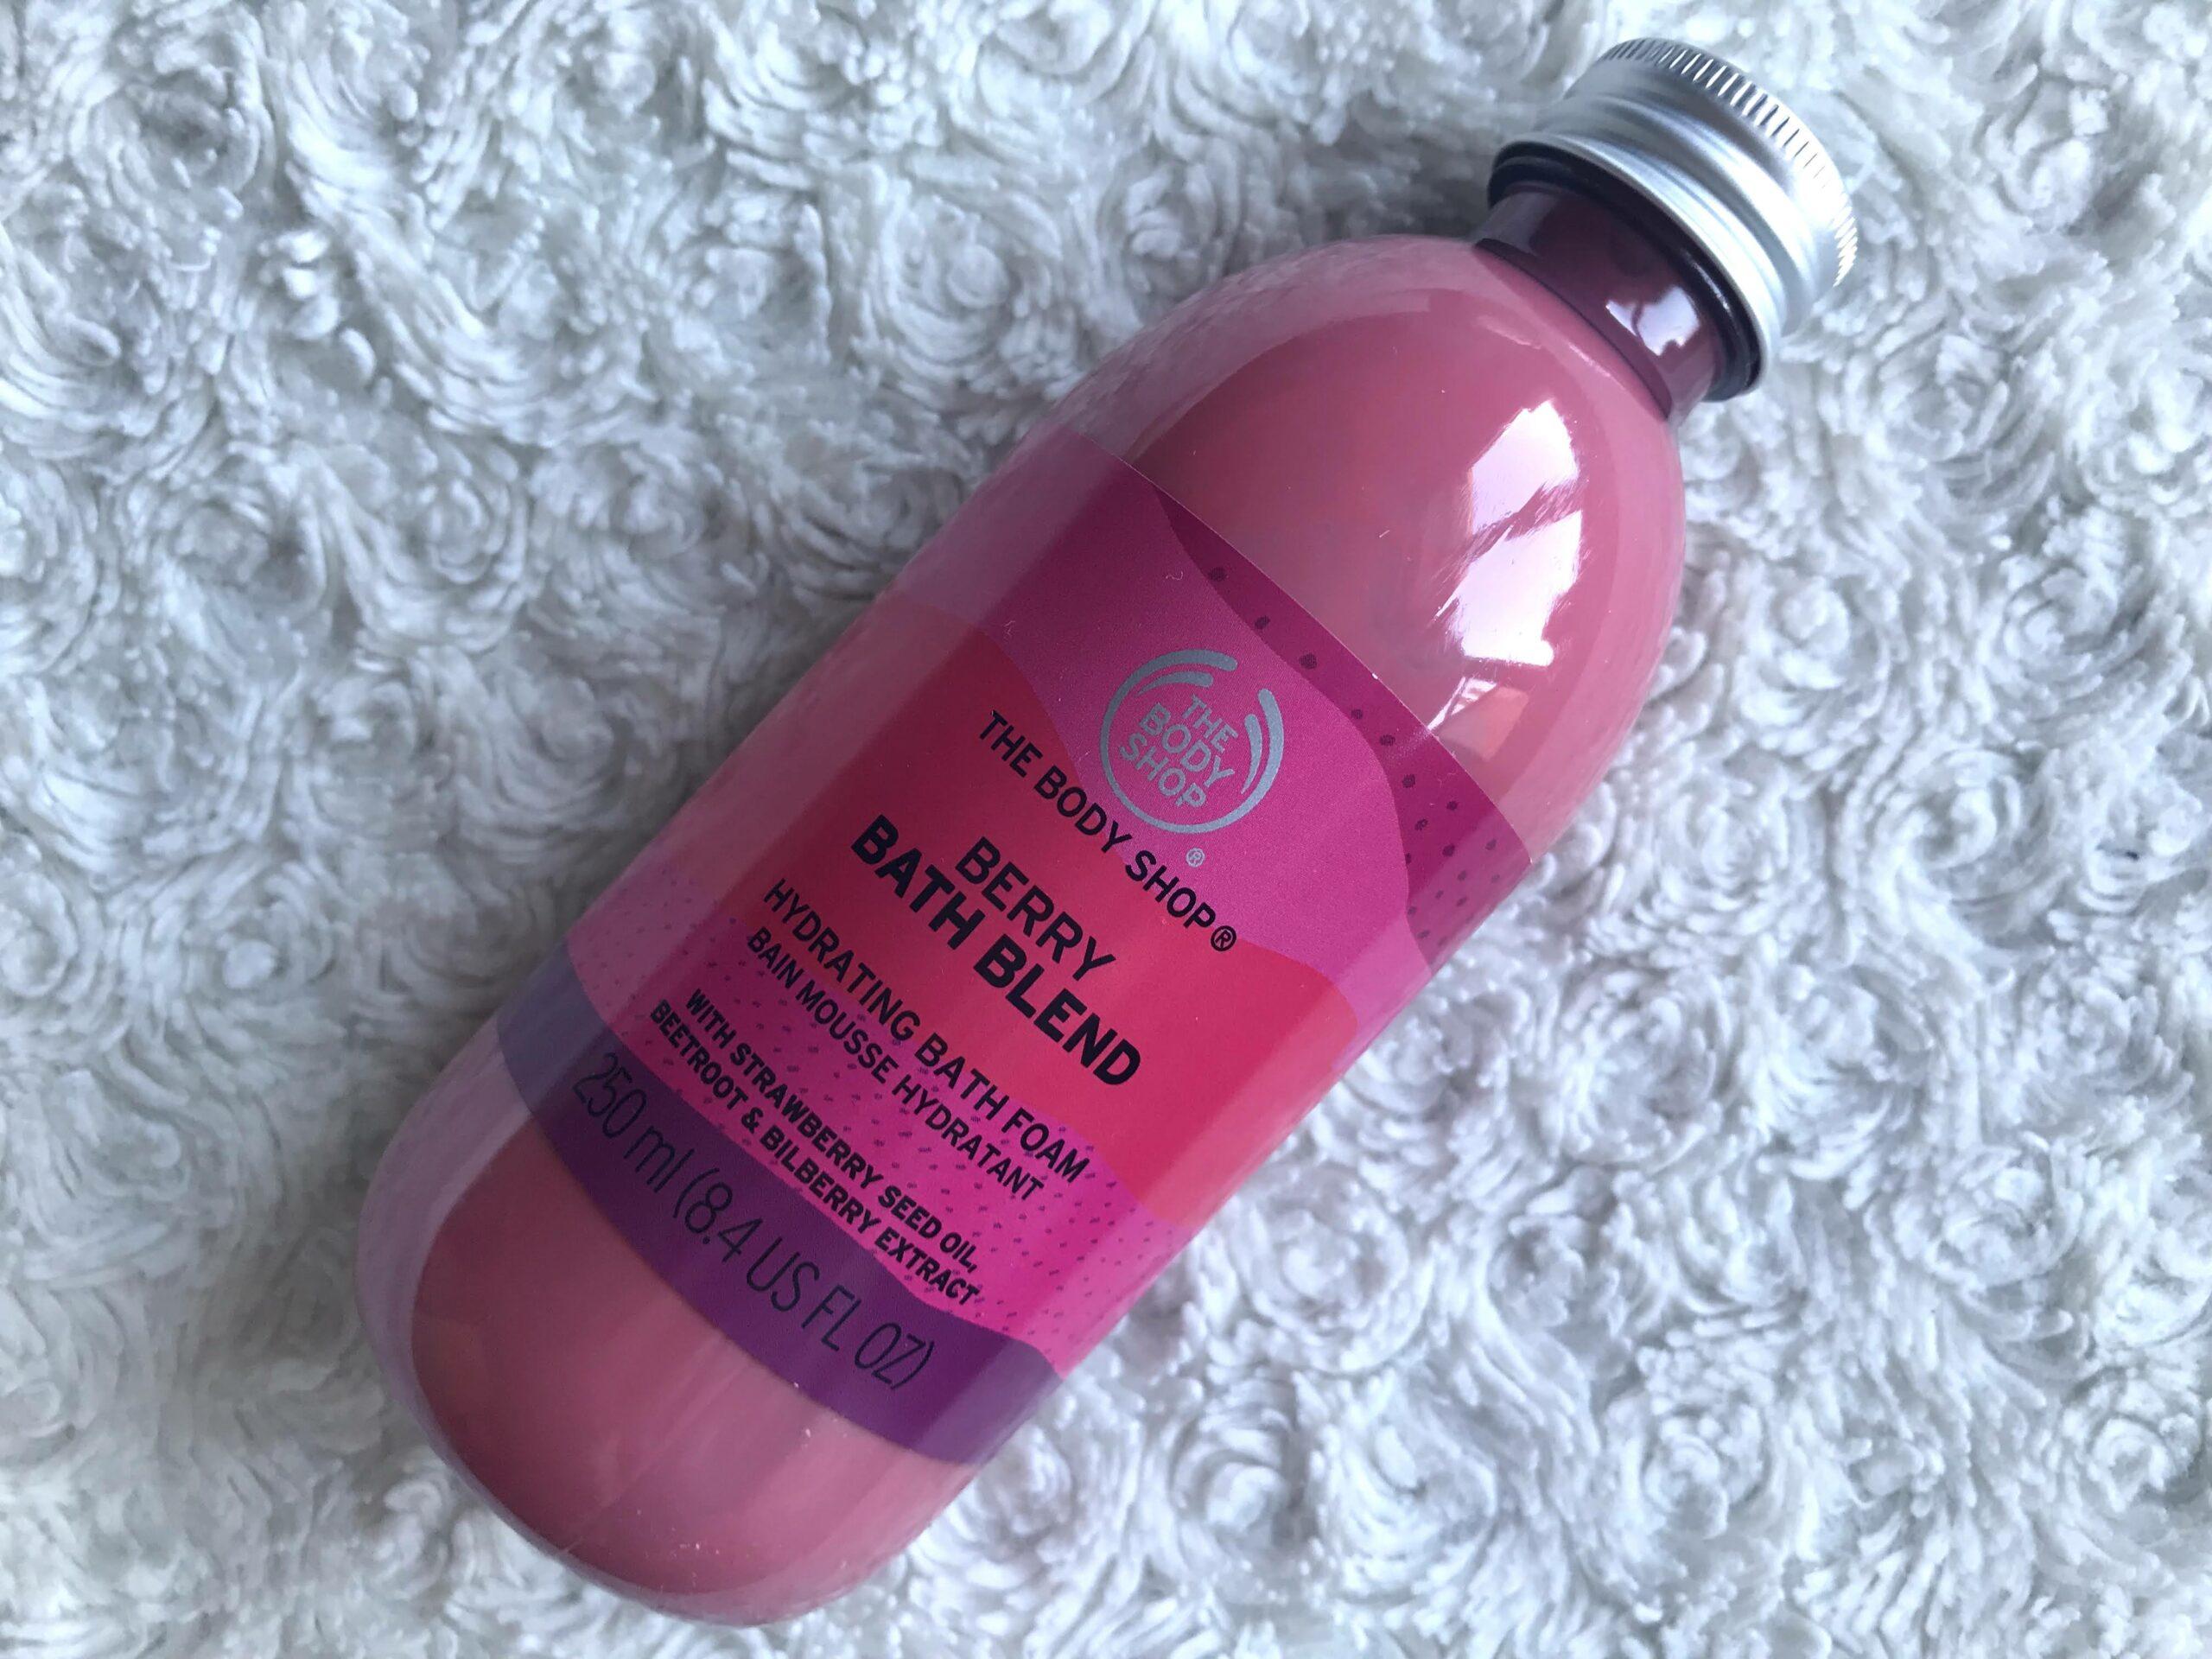 the body shop bath blend berry